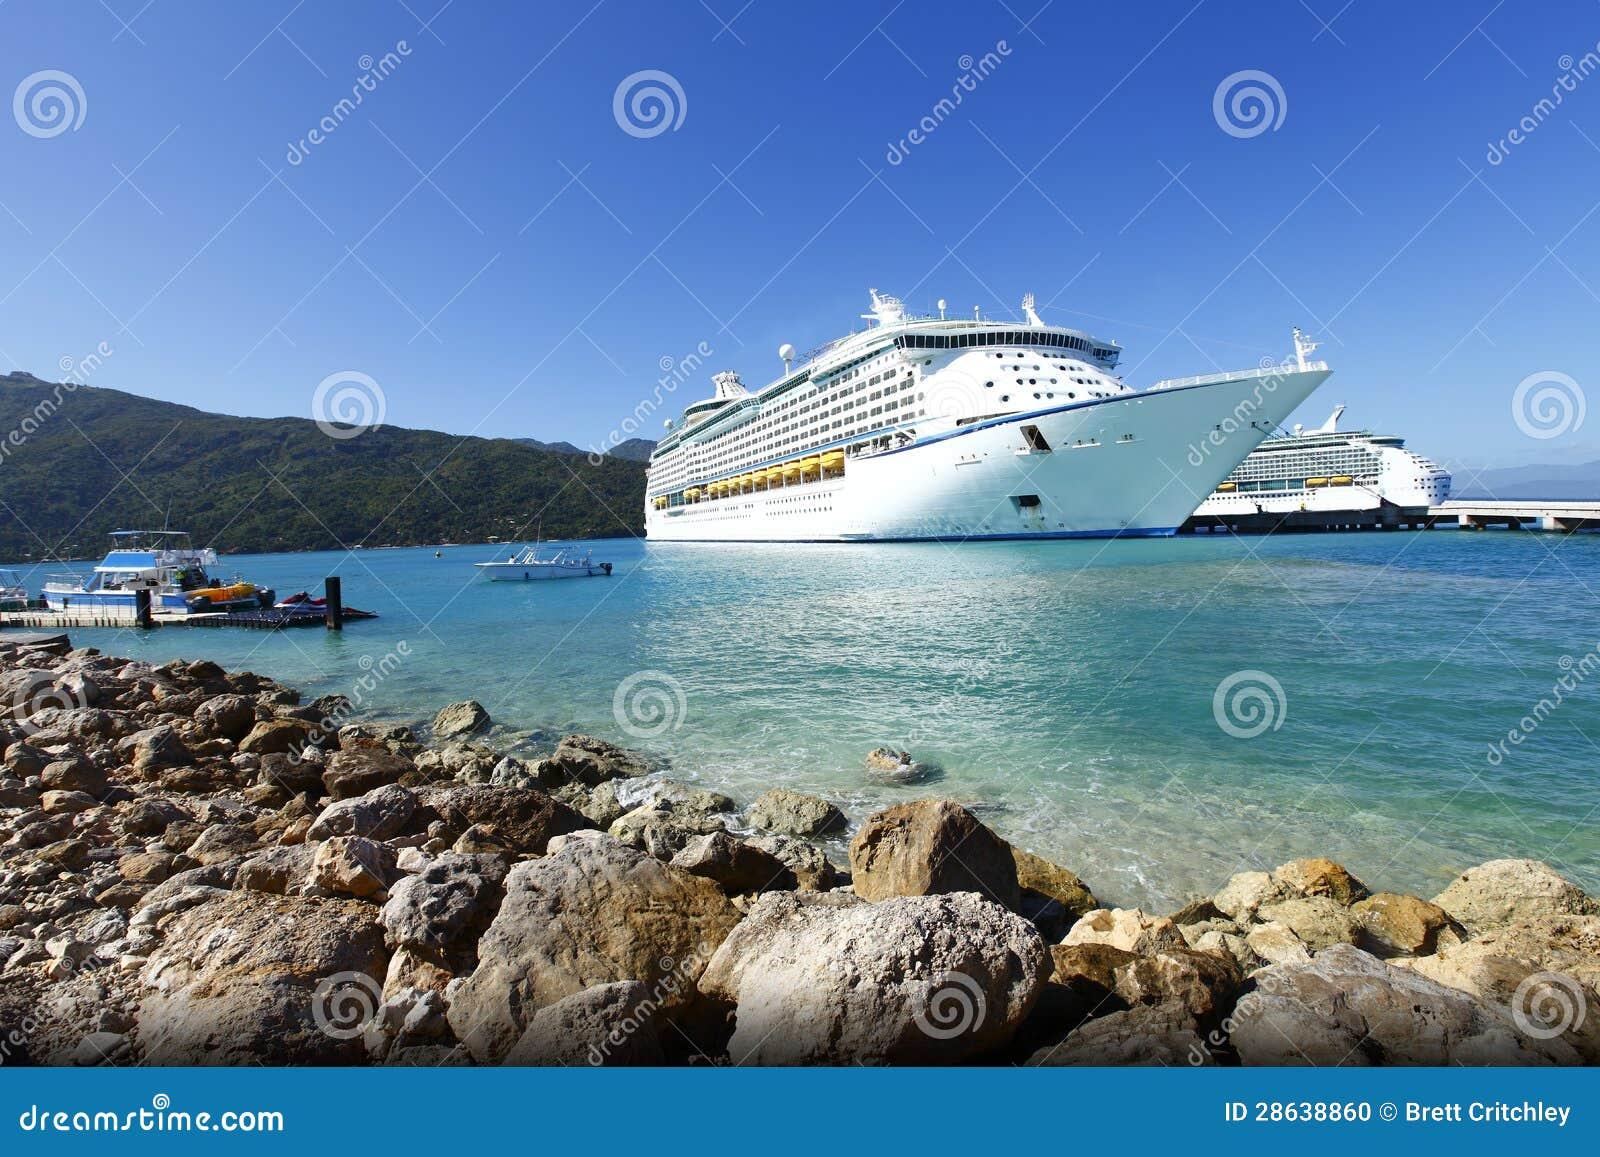 vacation cruise: